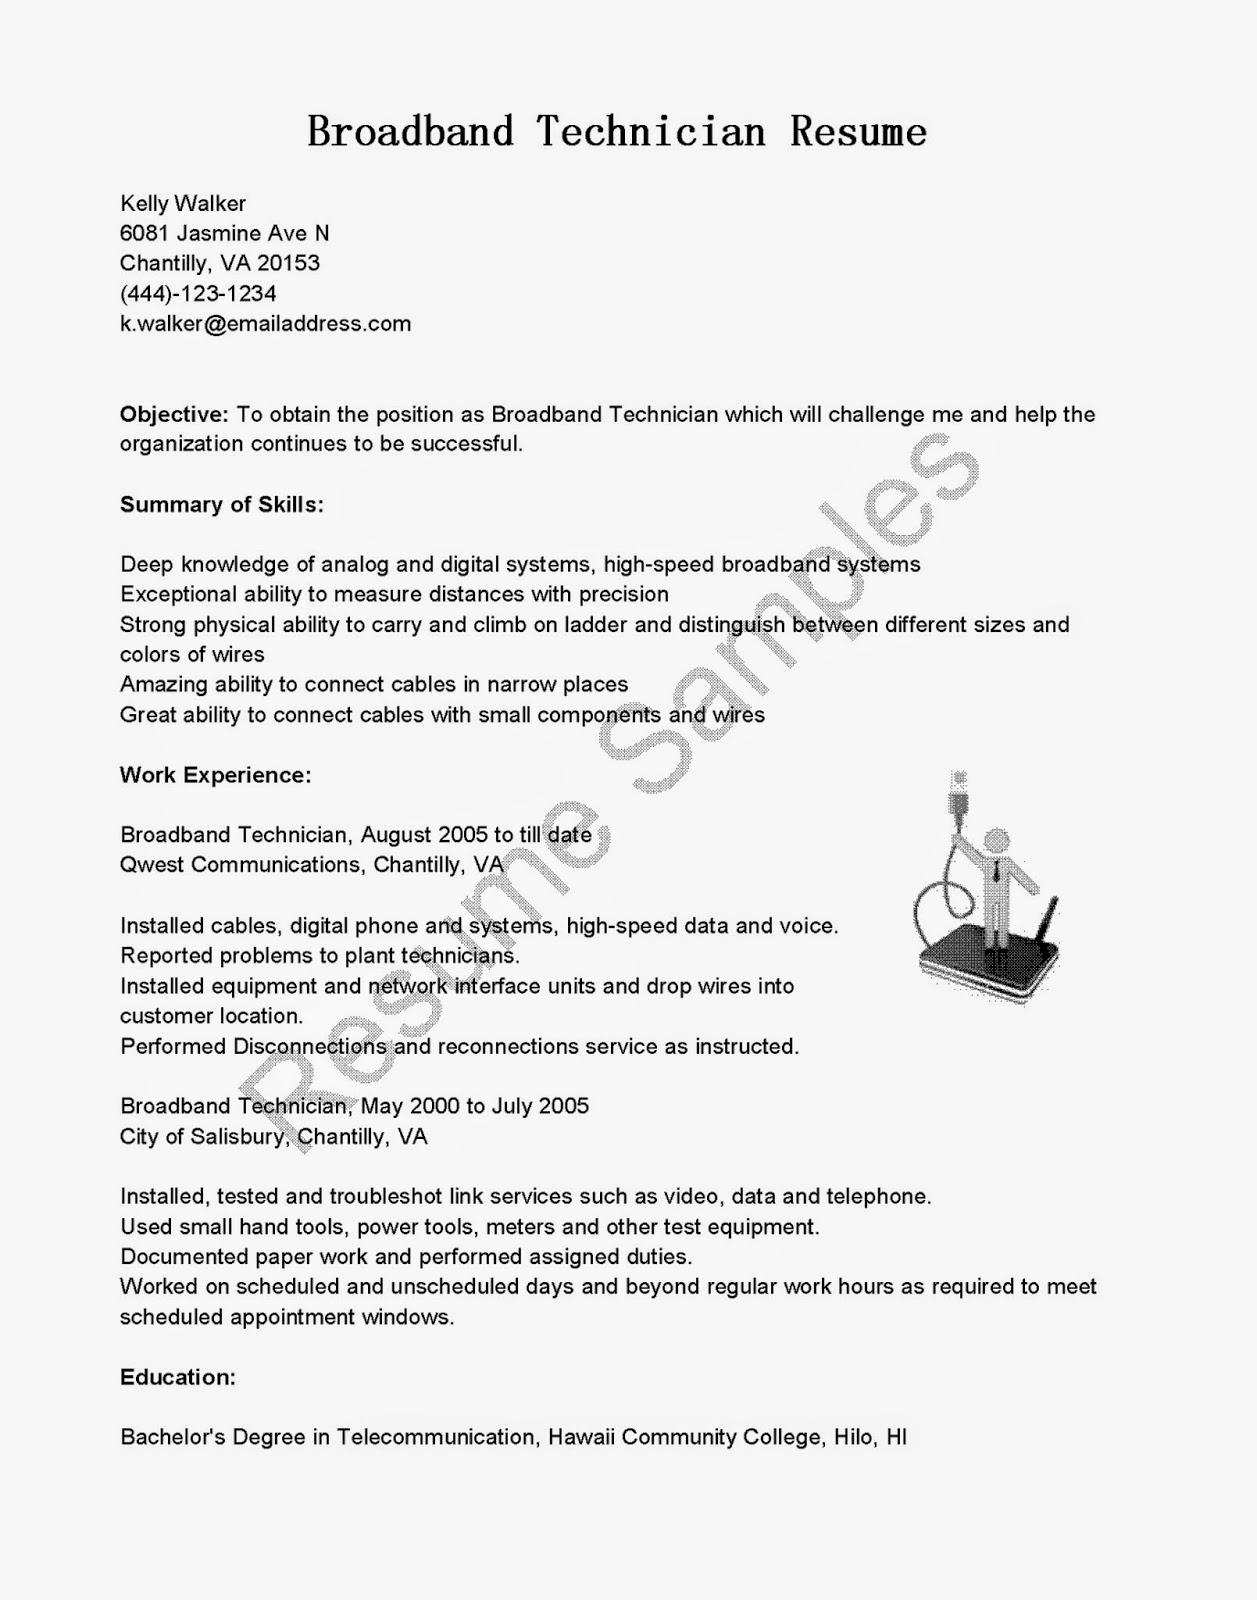 resume samples  broadband technician resume sample